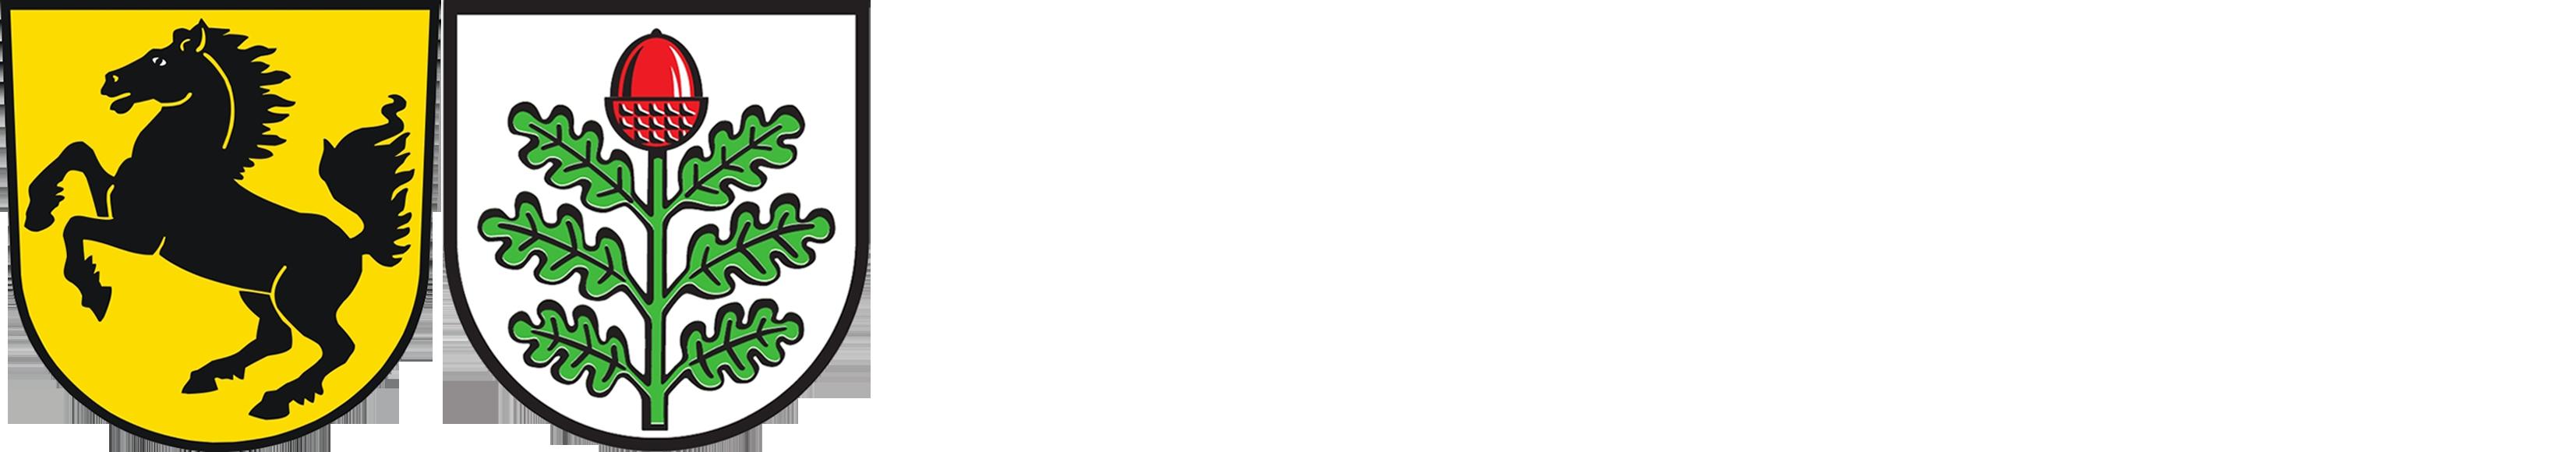 Freiw. Feuerwehr Stuttgart, Abt. Wangen